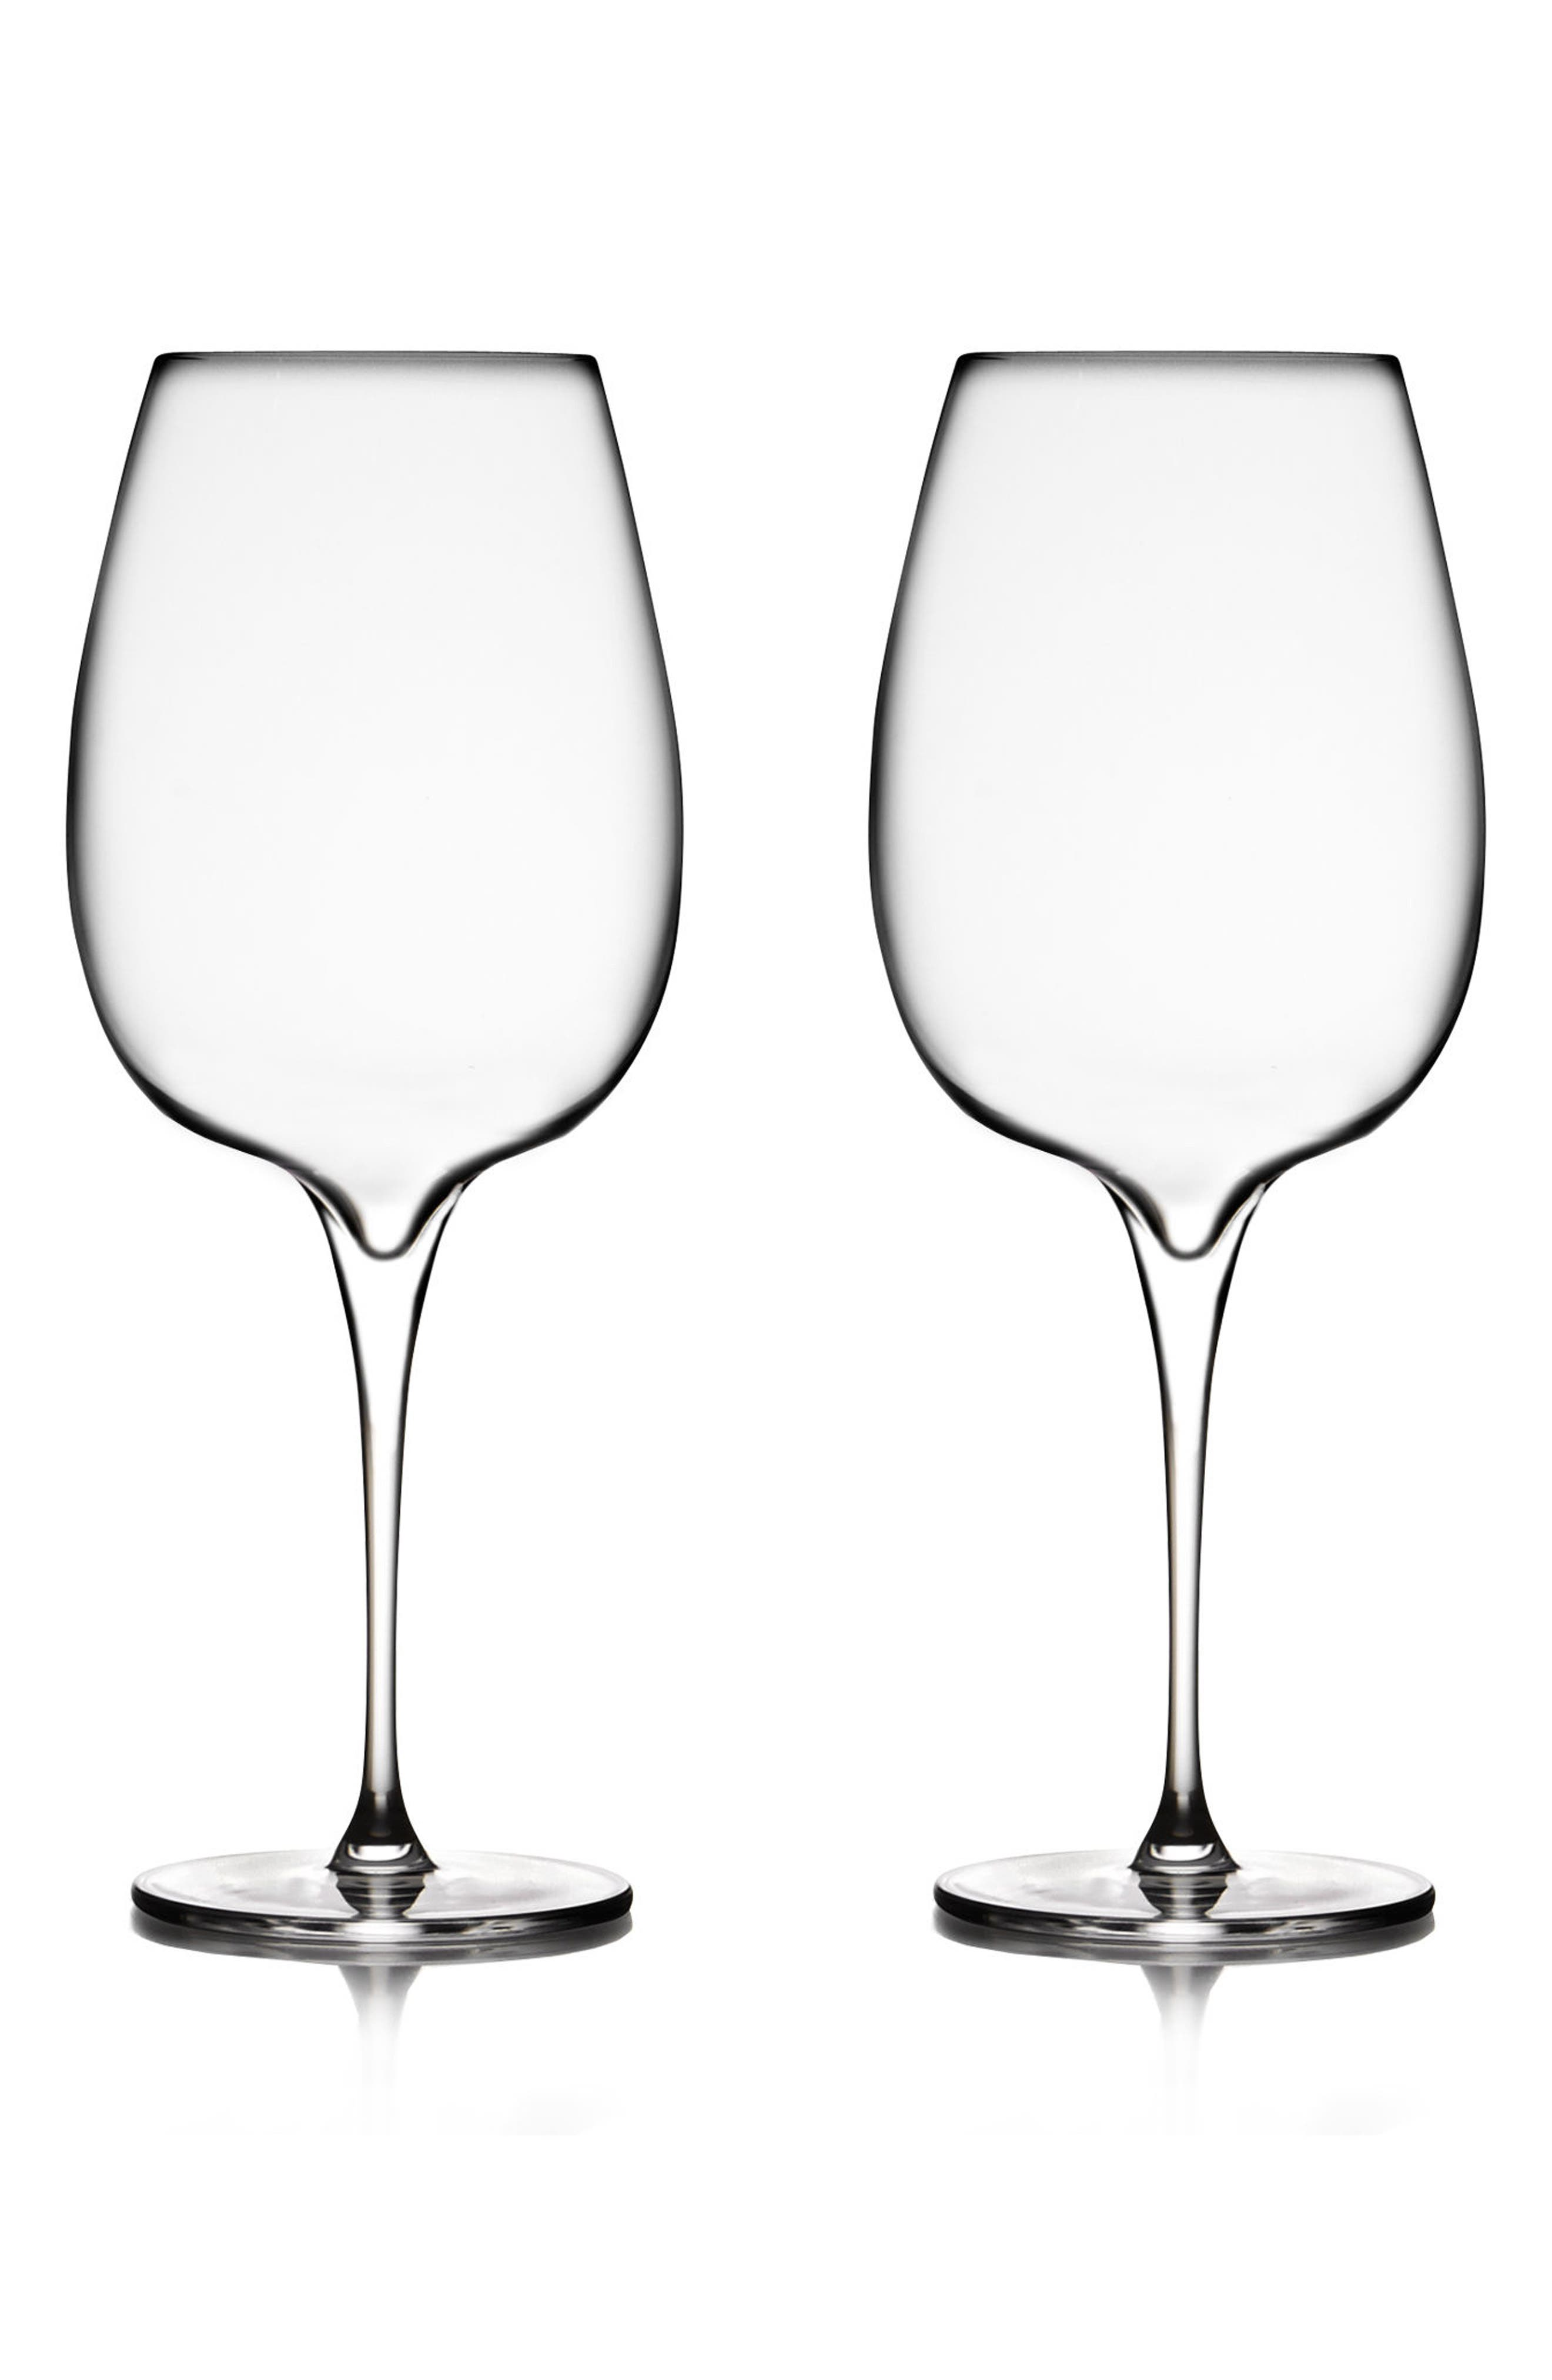 Main Image - Nambé Vie Set of 2 Cabernet Glasses